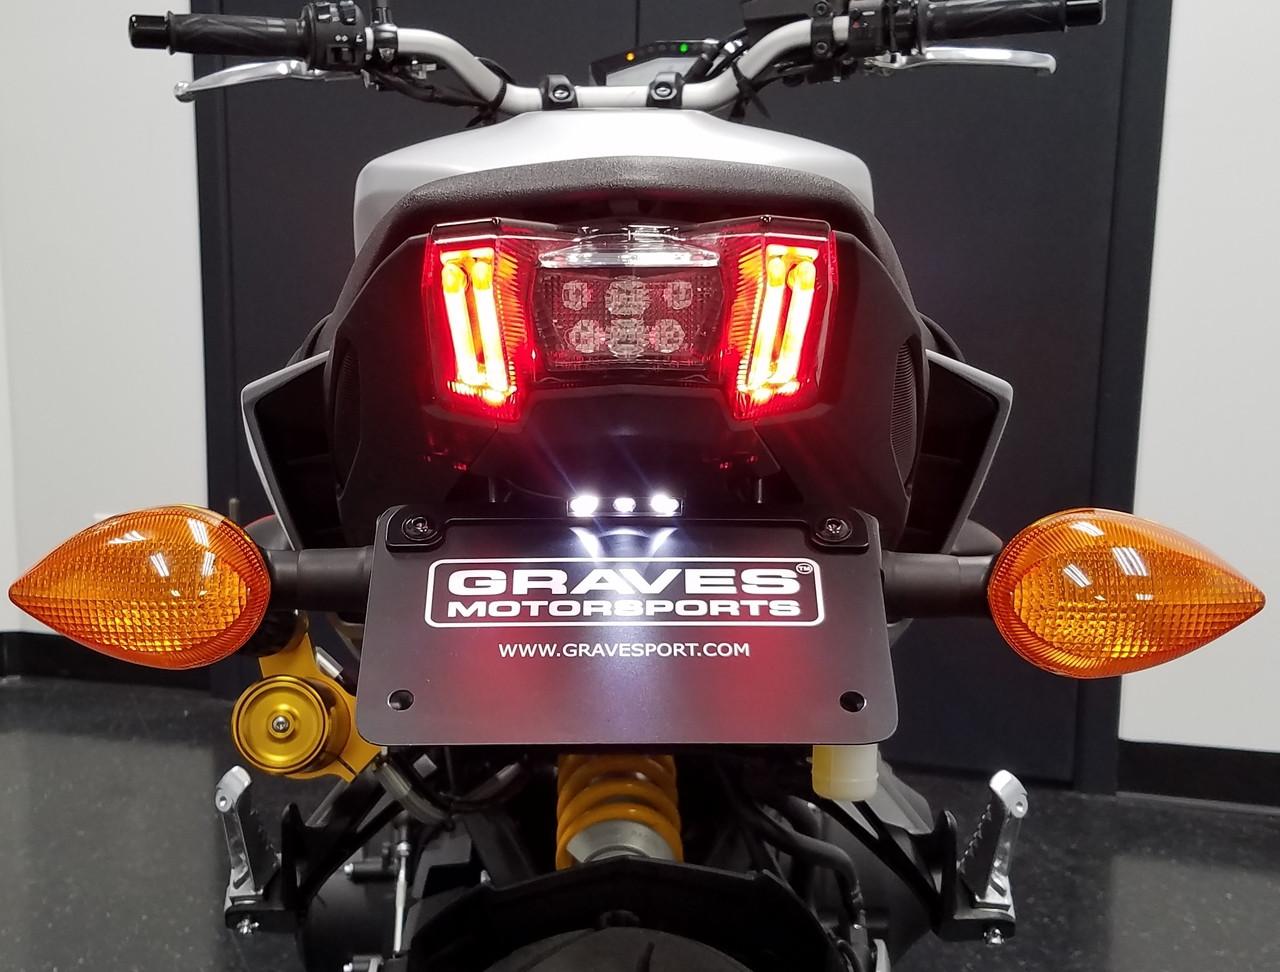 Graves Motorsports Yamaha XSR900 FZ09 MT-09 FJ09 Full Titanium Exhaust